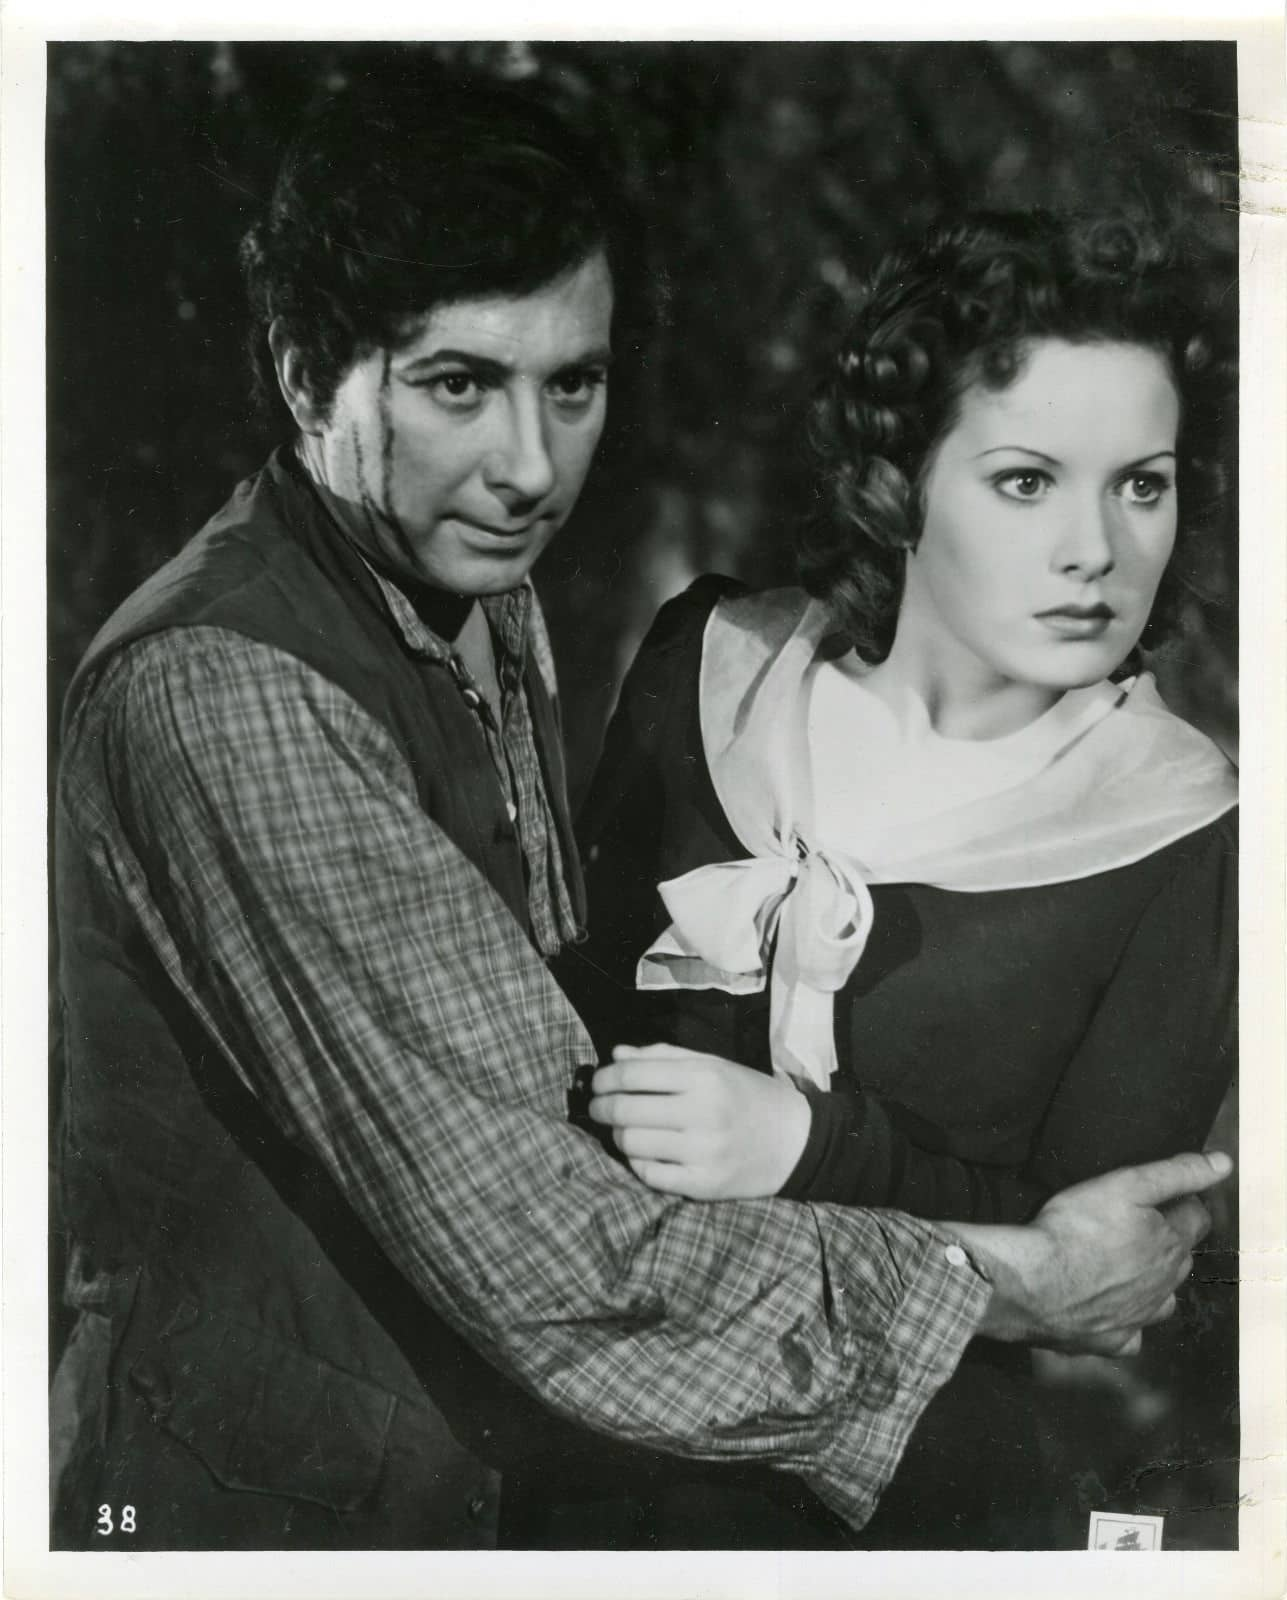 Robert Newton and Maureen O'Hara in Jamaica Inn (1939, dir. Alfred Hitchcock)